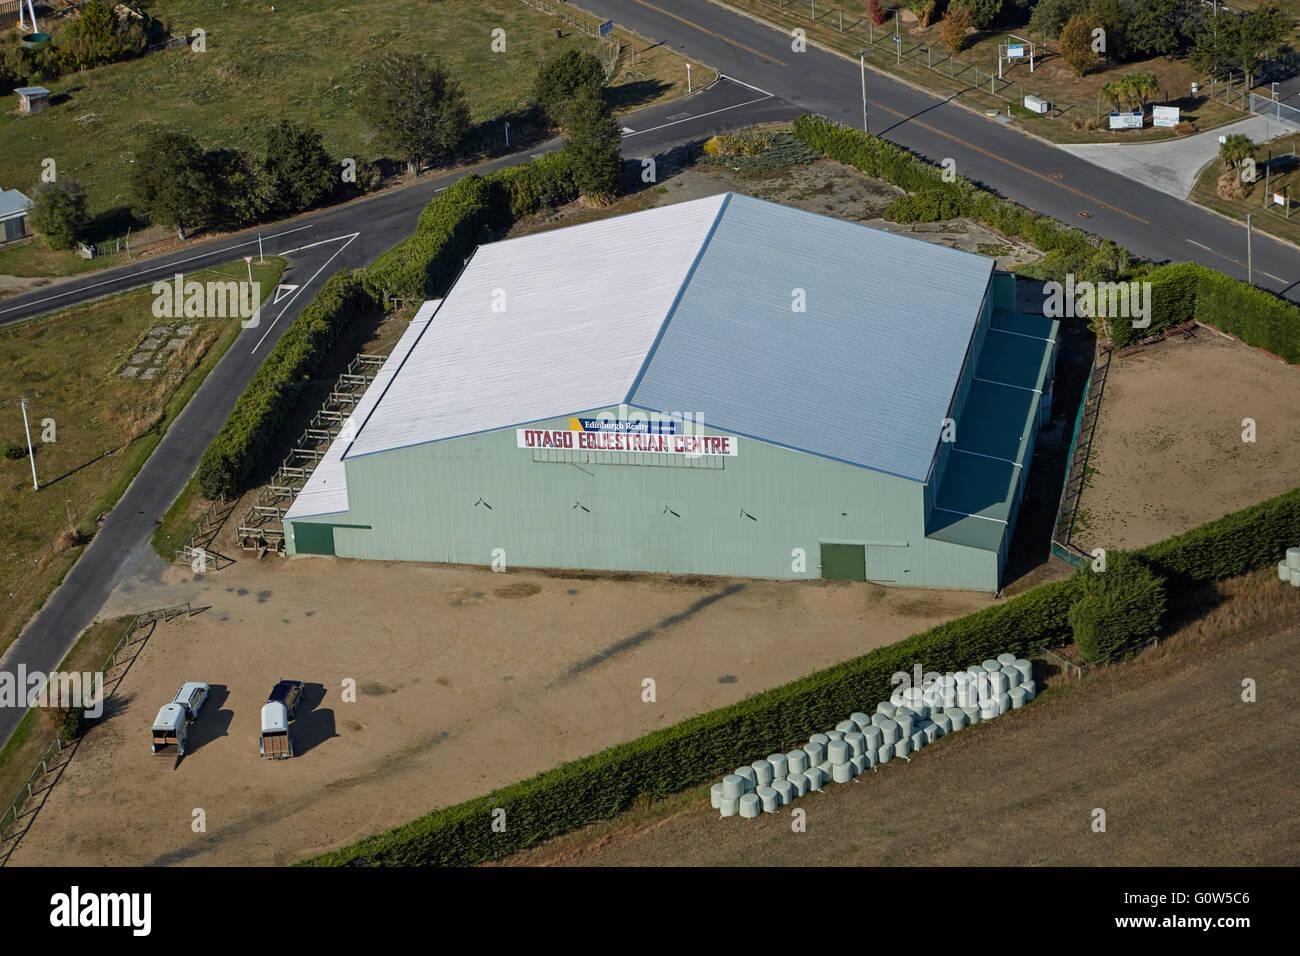 Otago Equestrian Centre, near Mosgiel, Dunedin, Otago, South Island, New Zealand - aerial - Stock Image